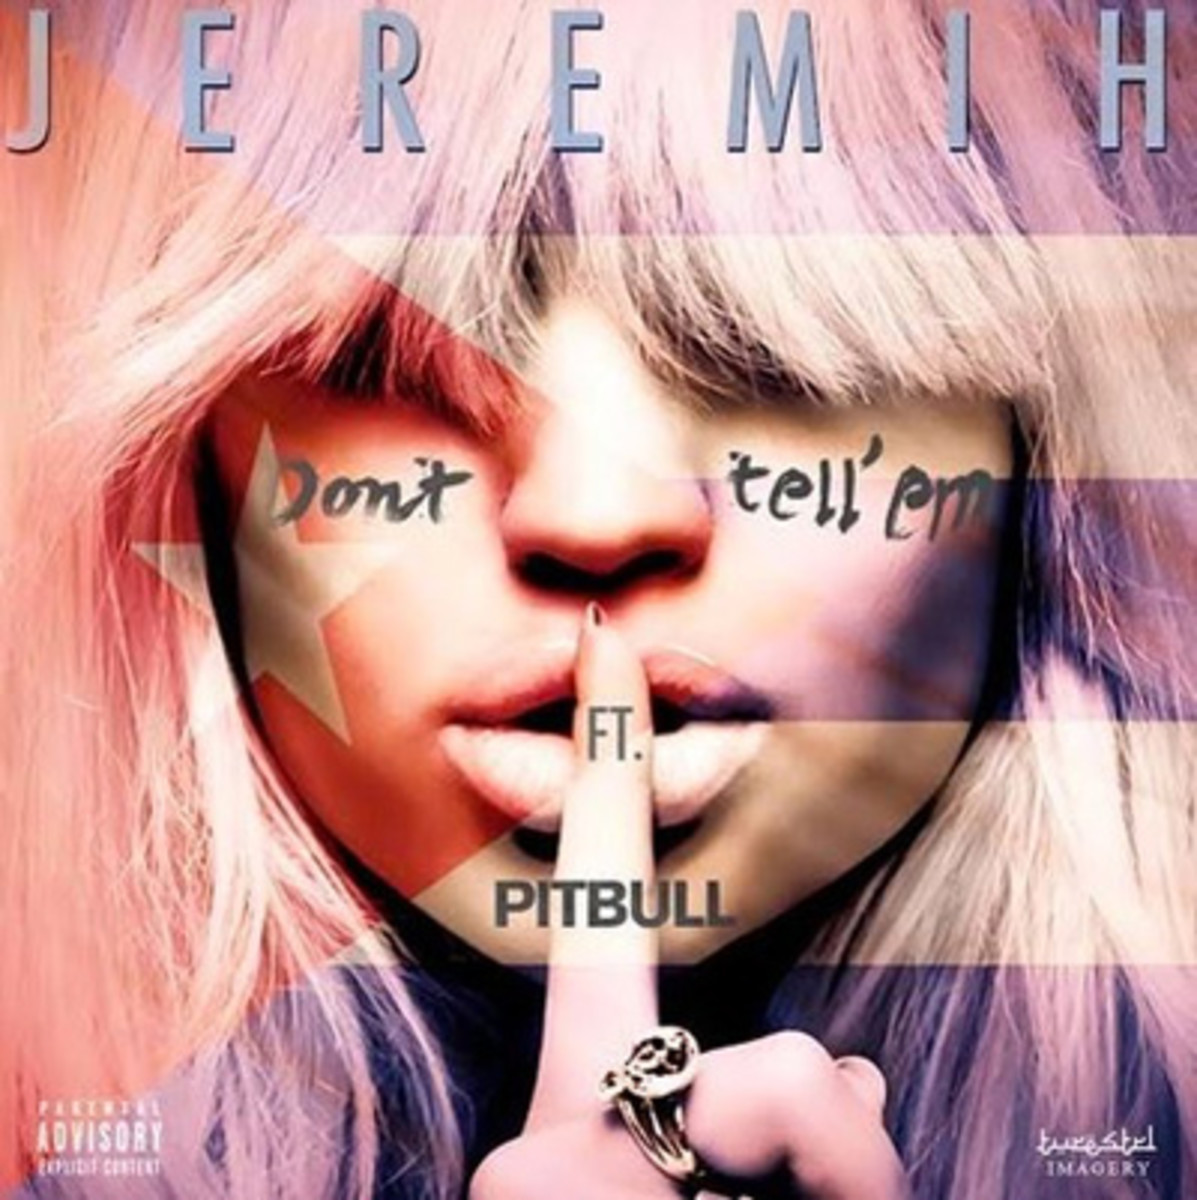 jeremih-donttellemremix.jpg